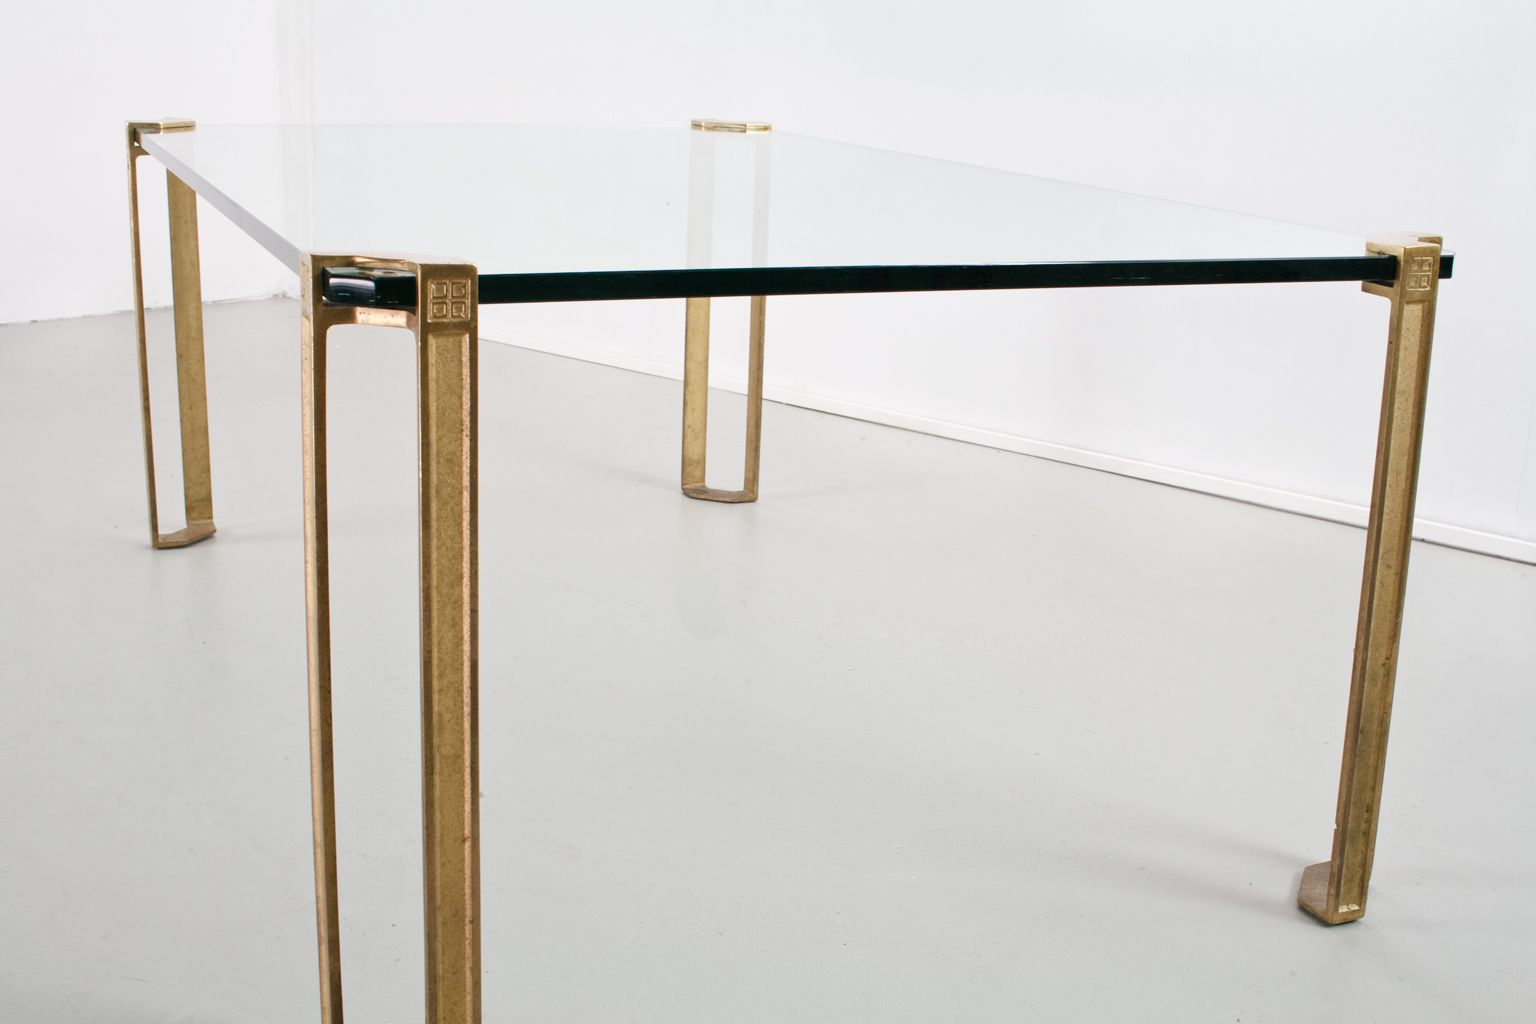 moderner tisch aus messing glas von peter ghyczy 1970er. Black Bedroom Furniture Sets. Home Design Ideas